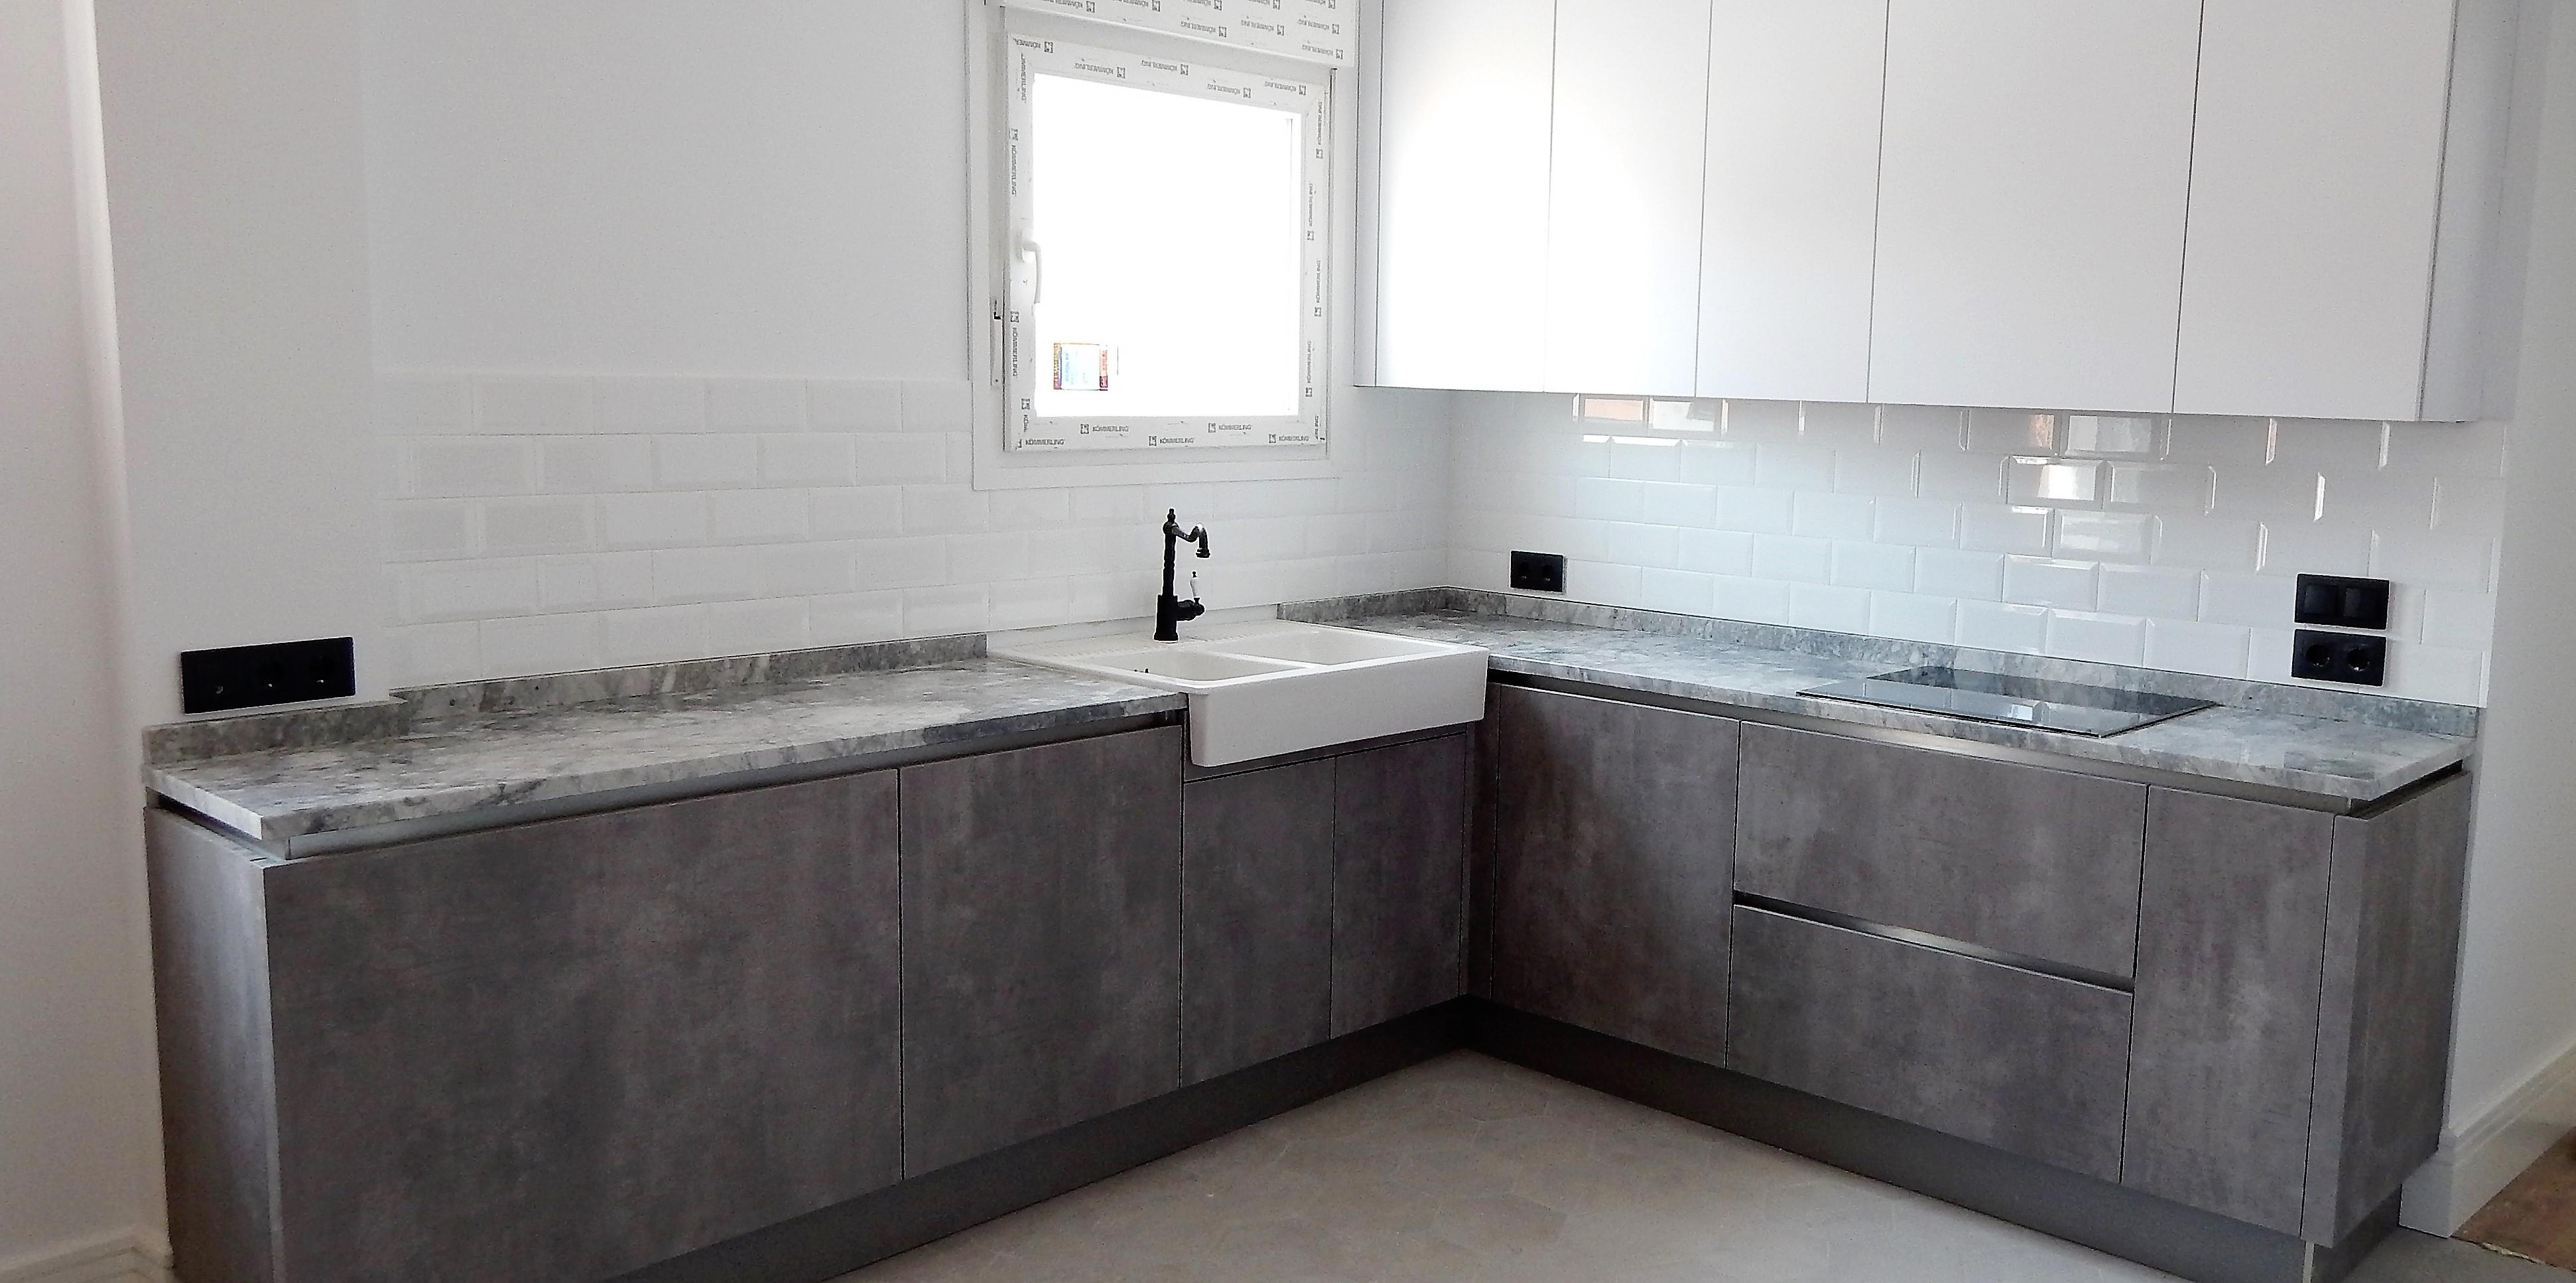 Muebles de cocina modernos blancos latest cocinas blancas for Muebles de cocina modernos